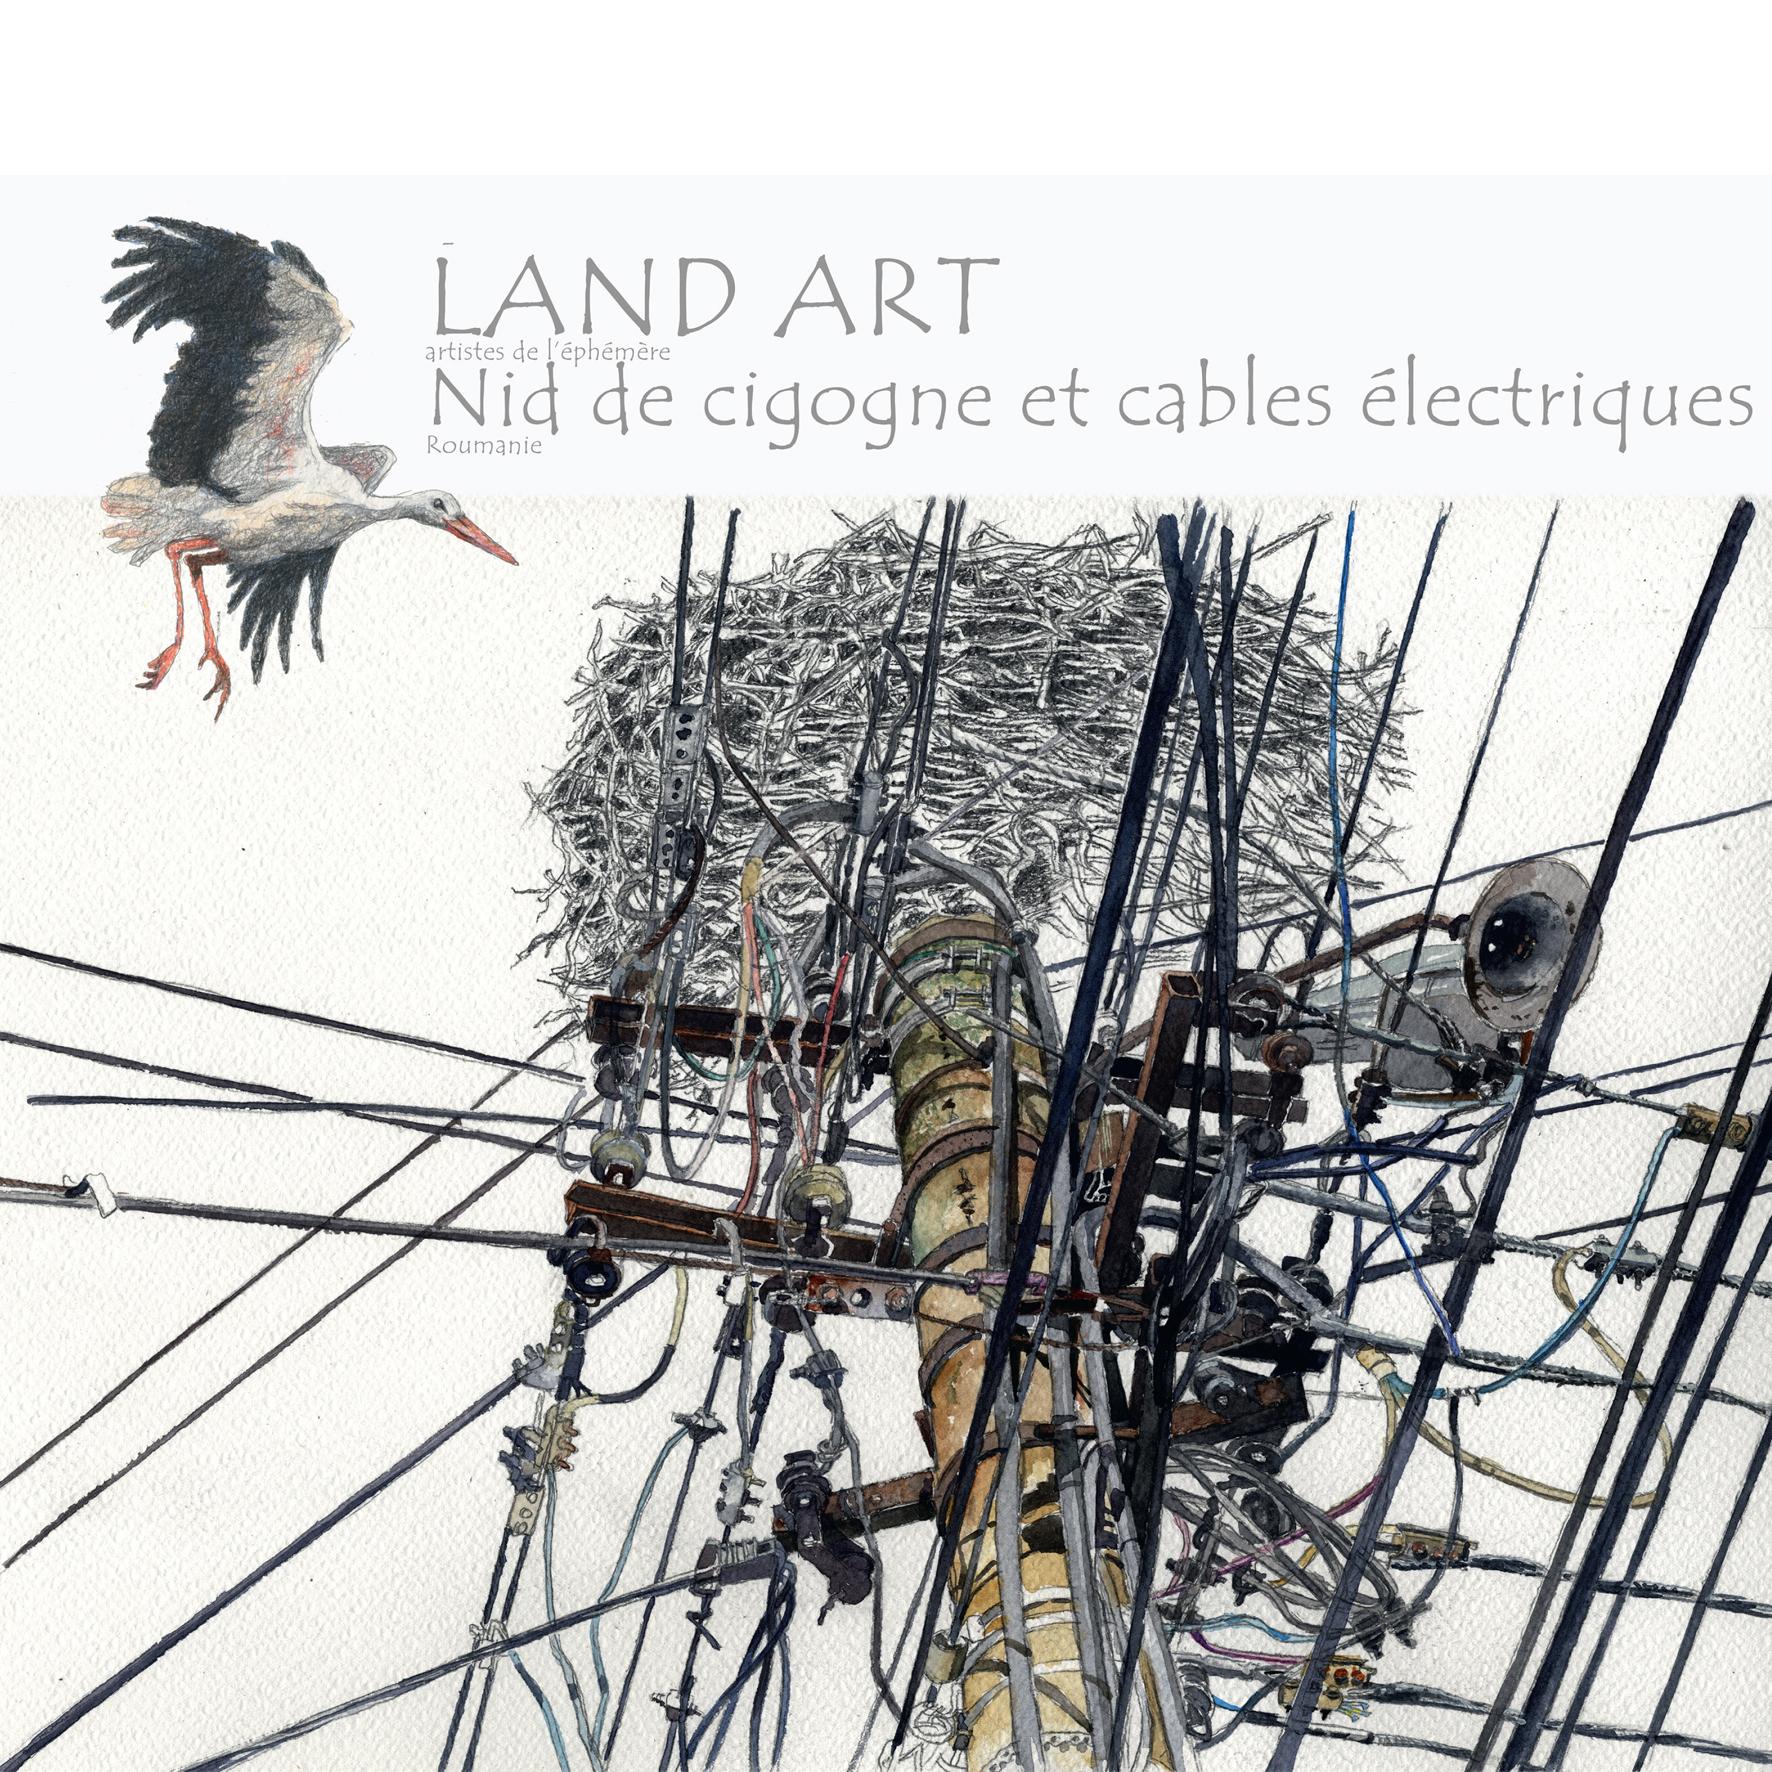 44-LAND ART.